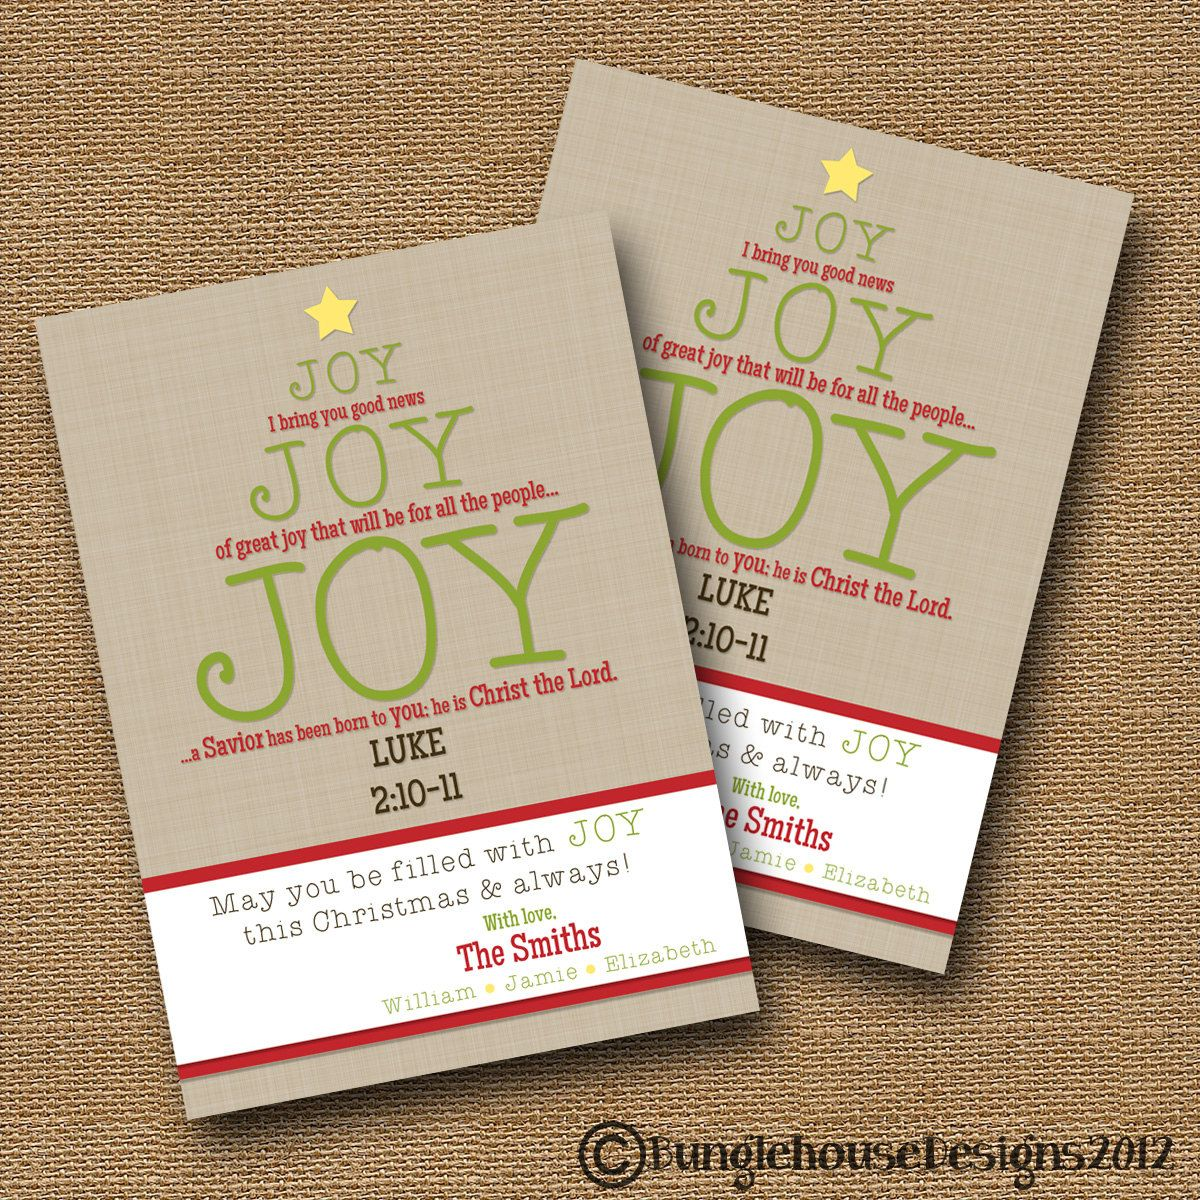 Enamour Card Diy Printable Joy Christian Scripture Bible Verse Typography Card Card Diy Printable Joy Christian Scripture inspiration Christmas Bible Verses For Cards